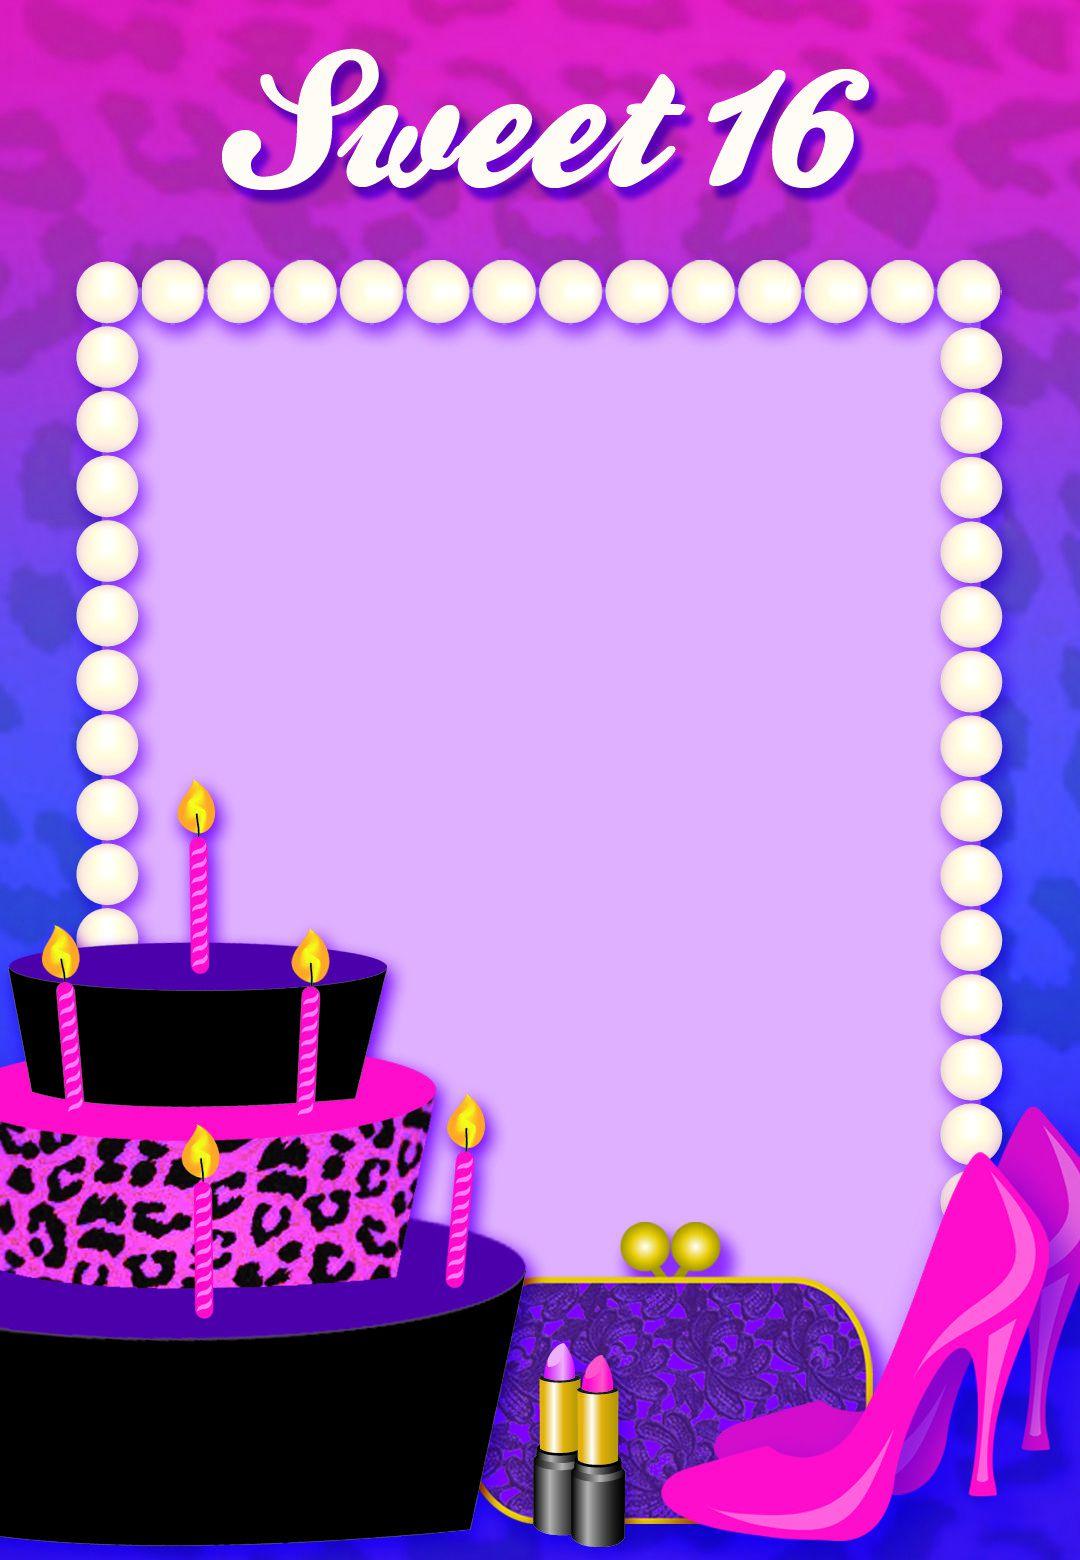 005 Unbelievable Sweet 16 Invite Template Idea  Templates Surprise Party Invitation Birthday Free 16thFull